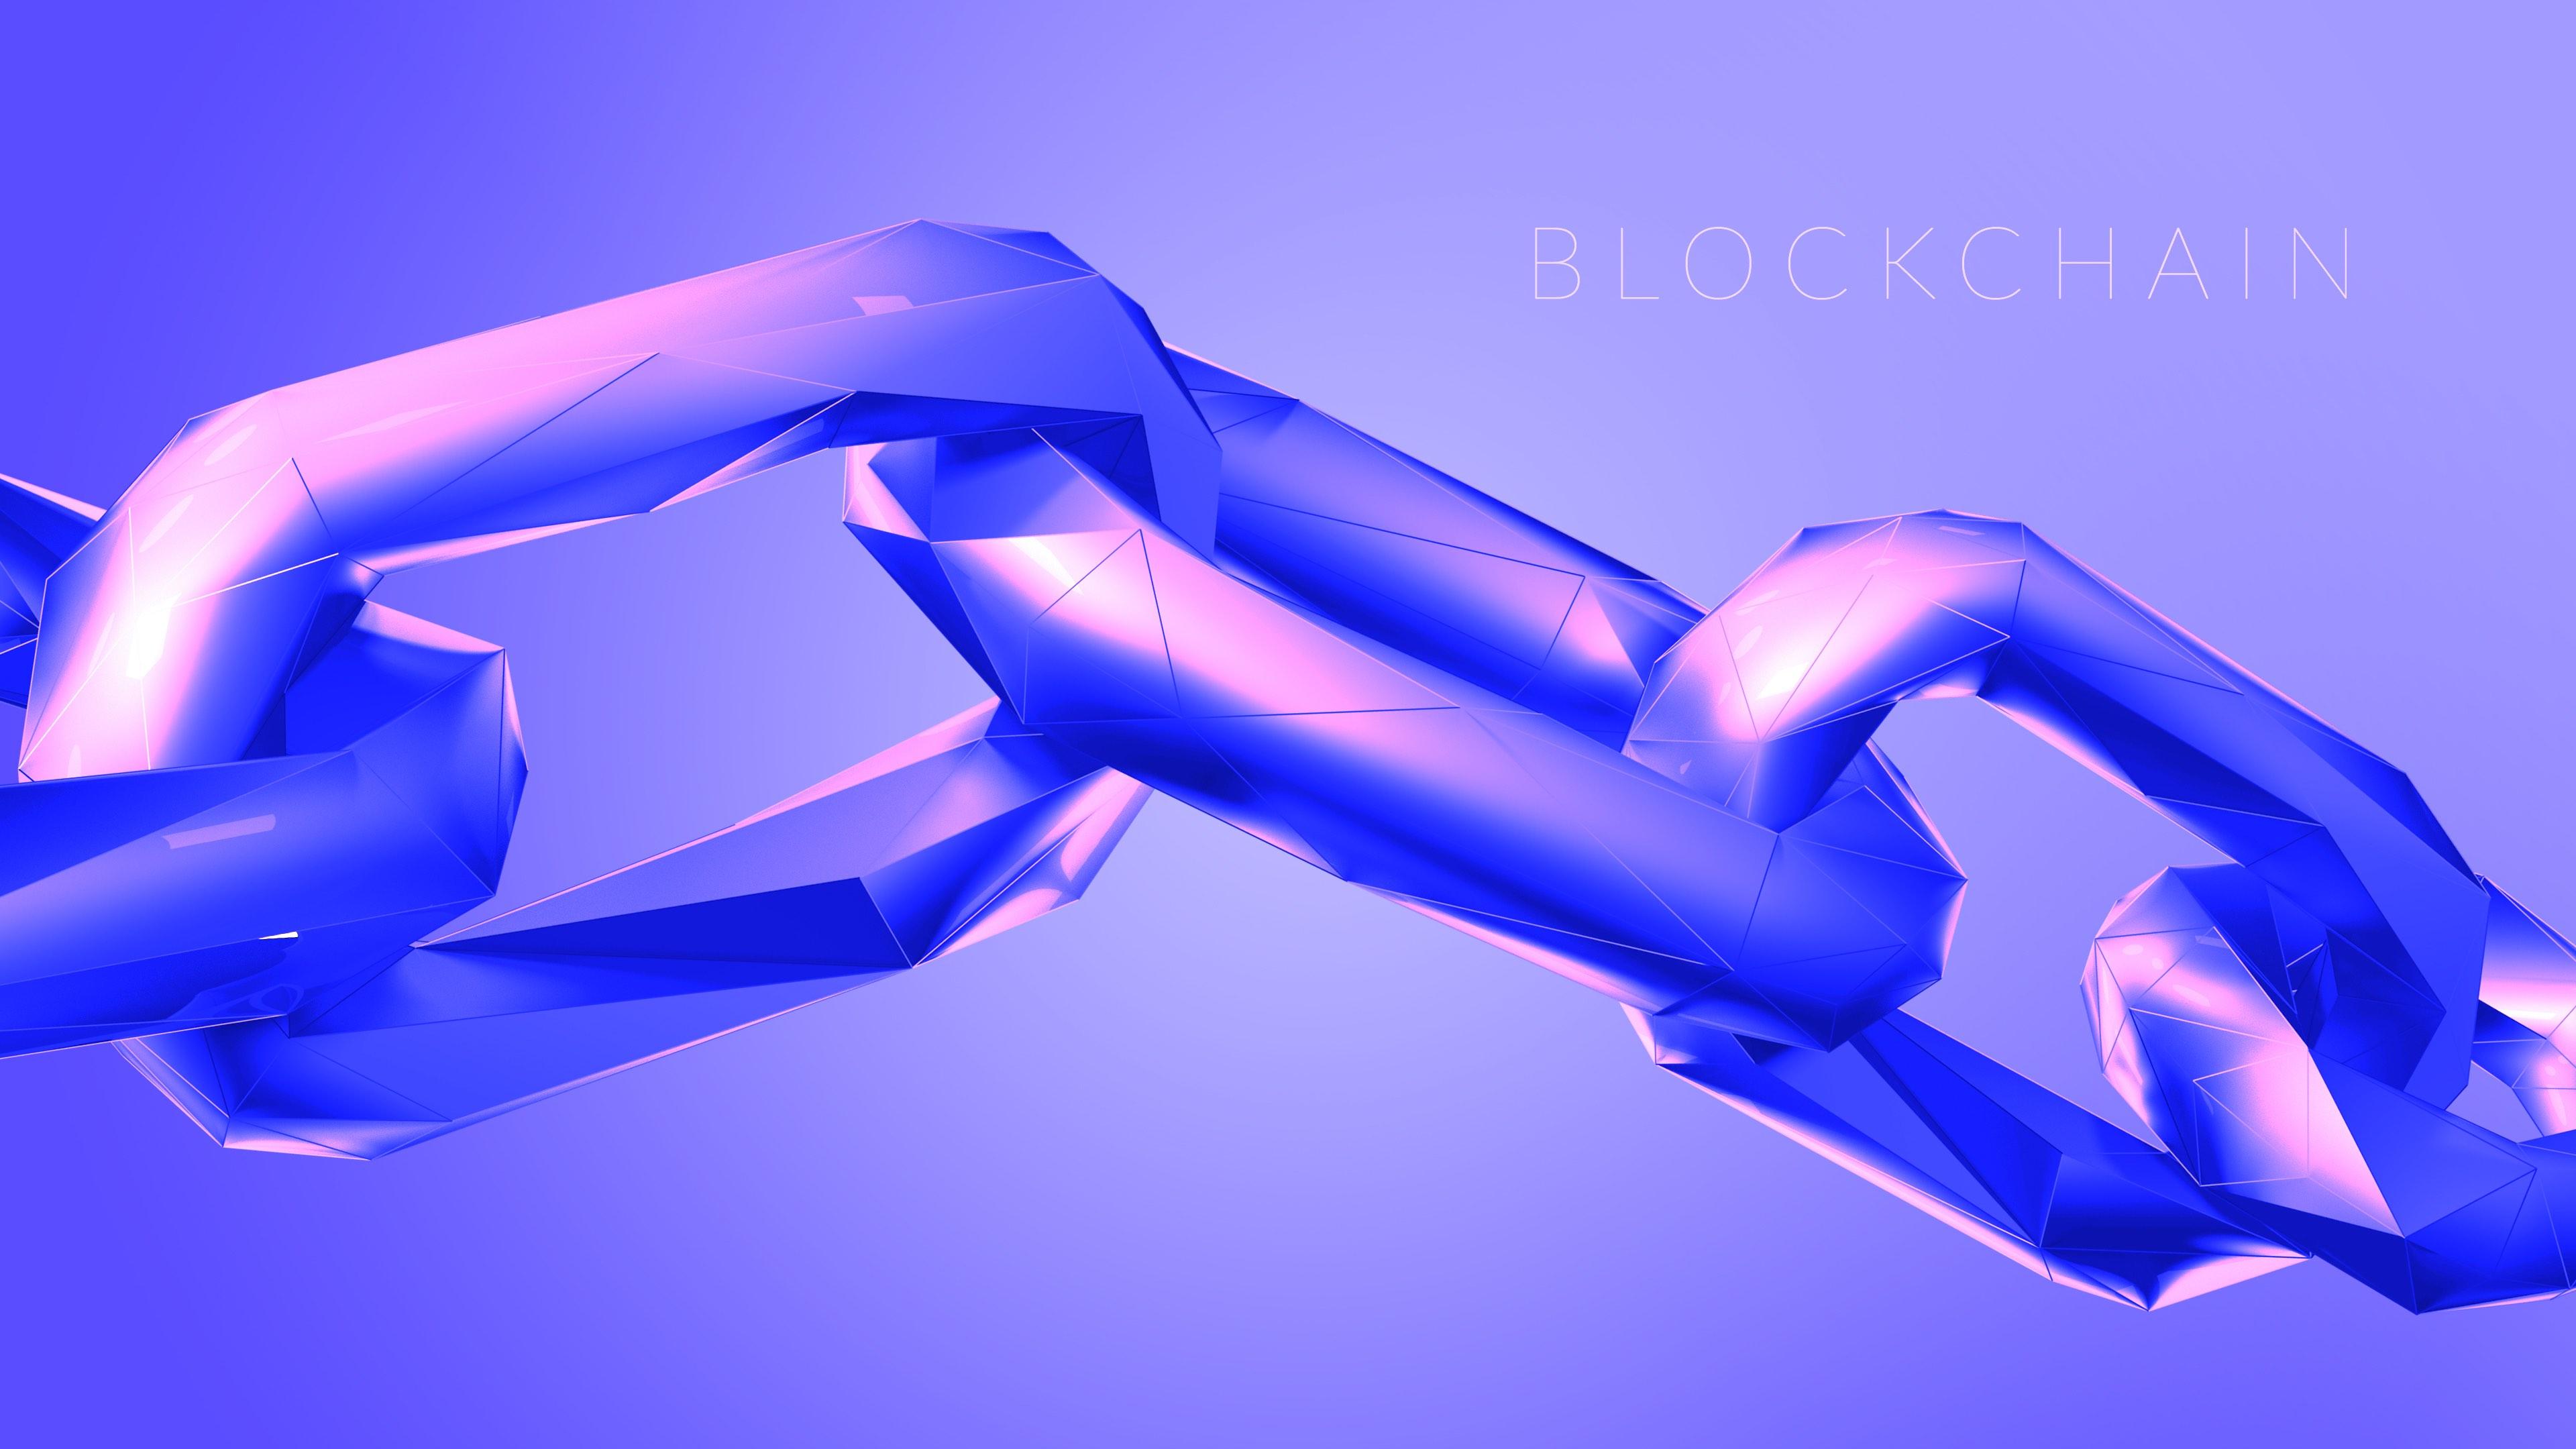 Blockchain_Illustration_4.jpg